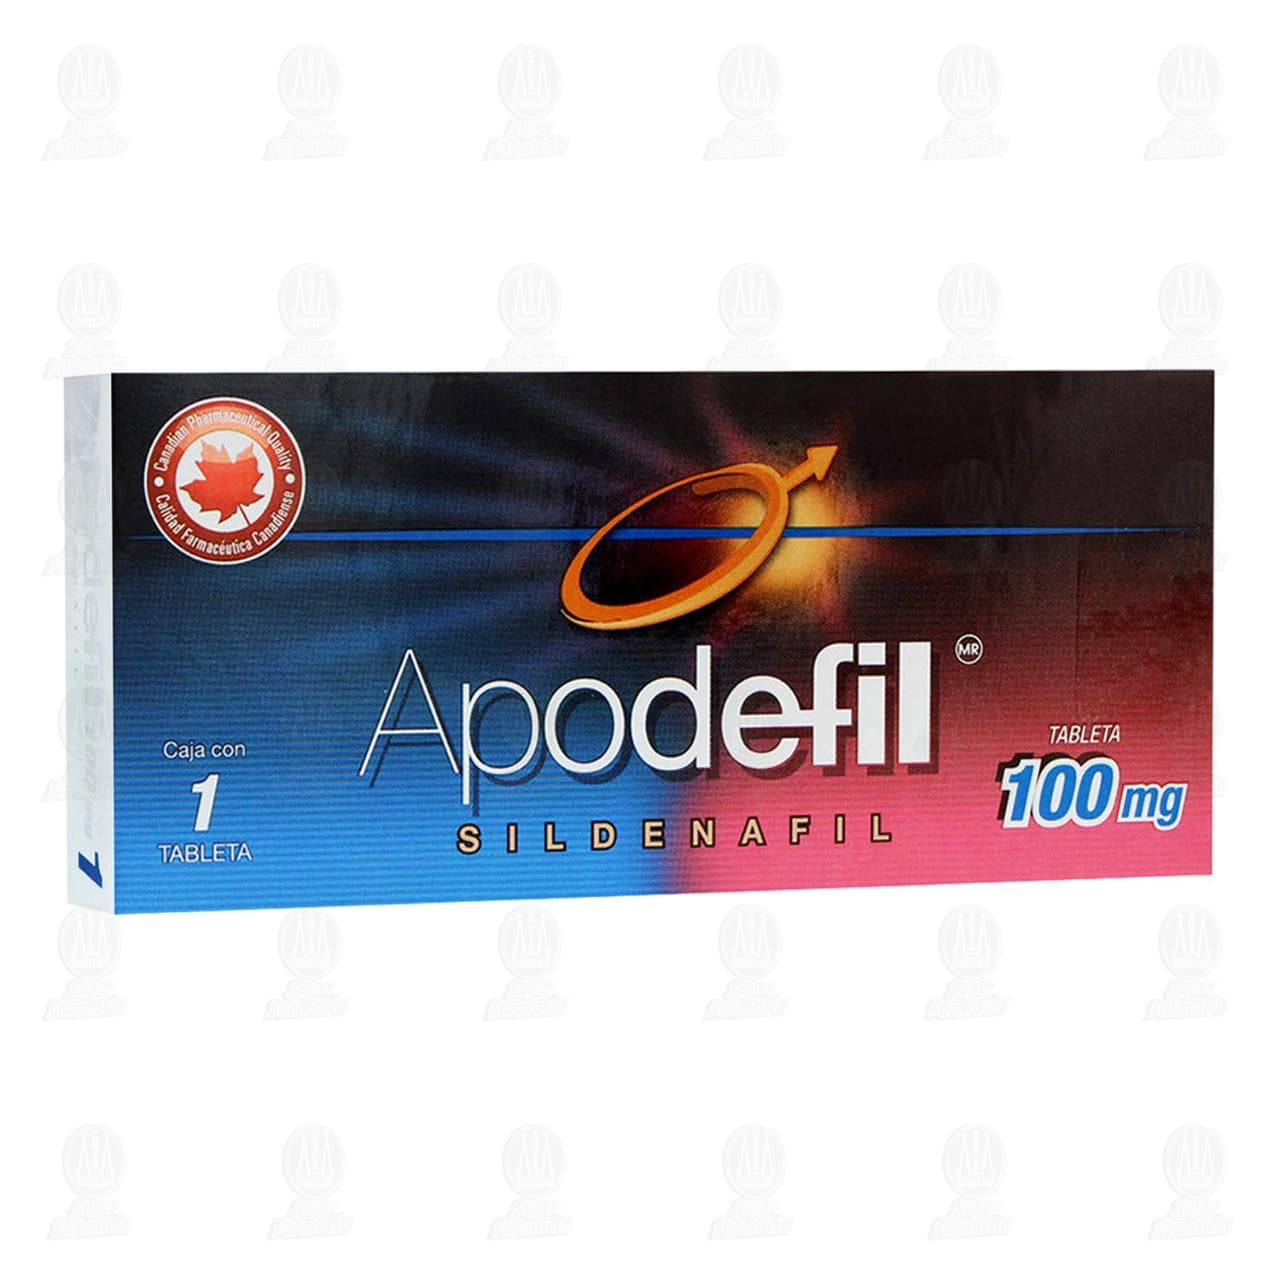 Comprar Apodefil 100mg 1 Tableta en Farmacias Guadalajara